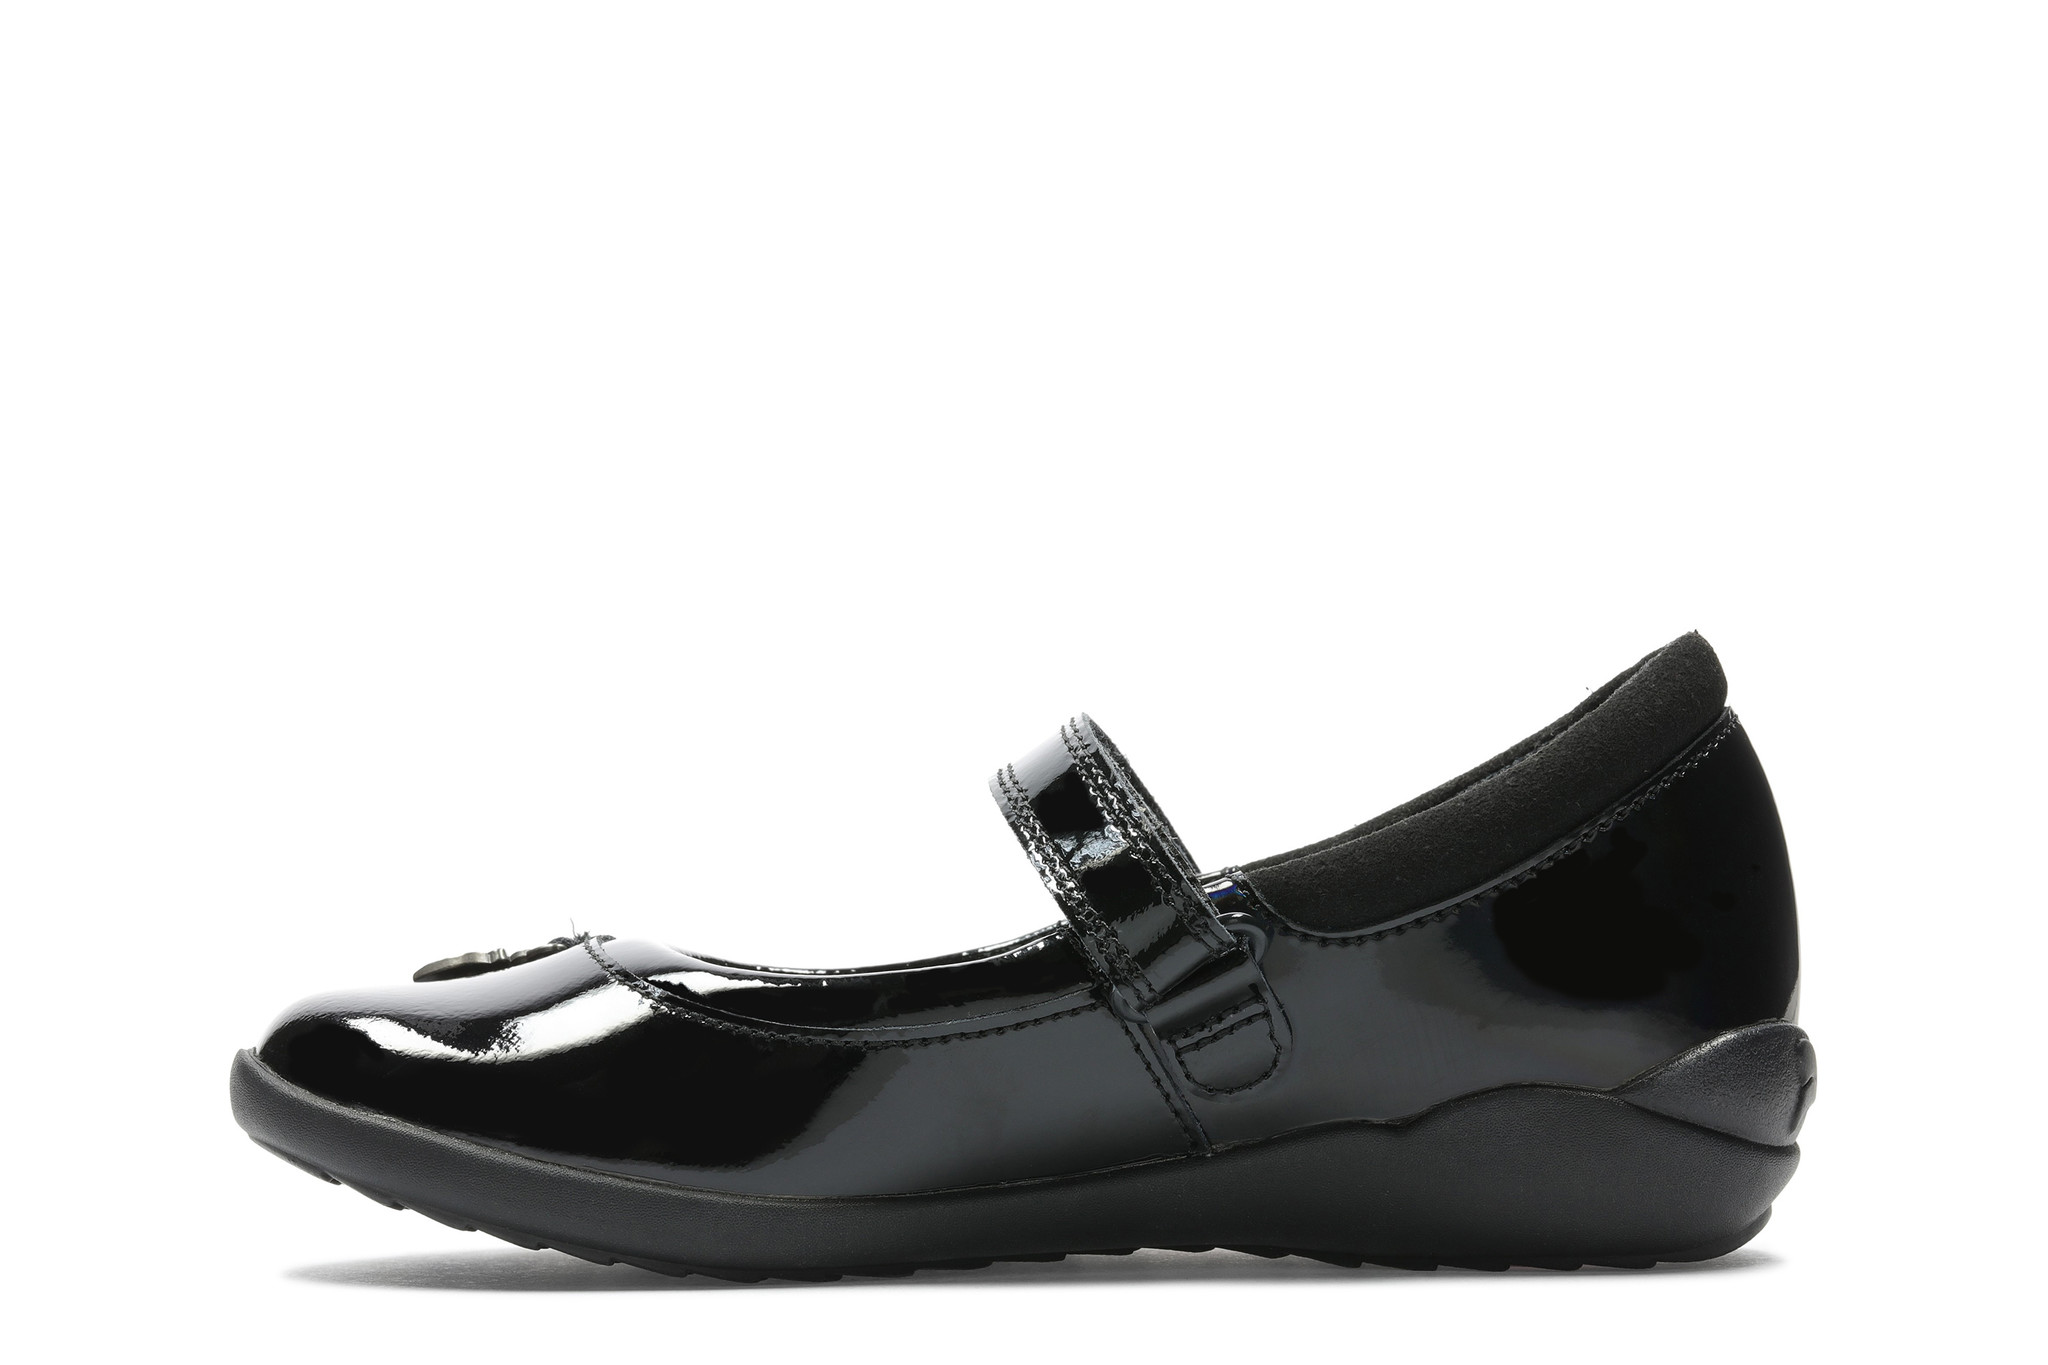 Clarks Vibrant Trail K Black Leather